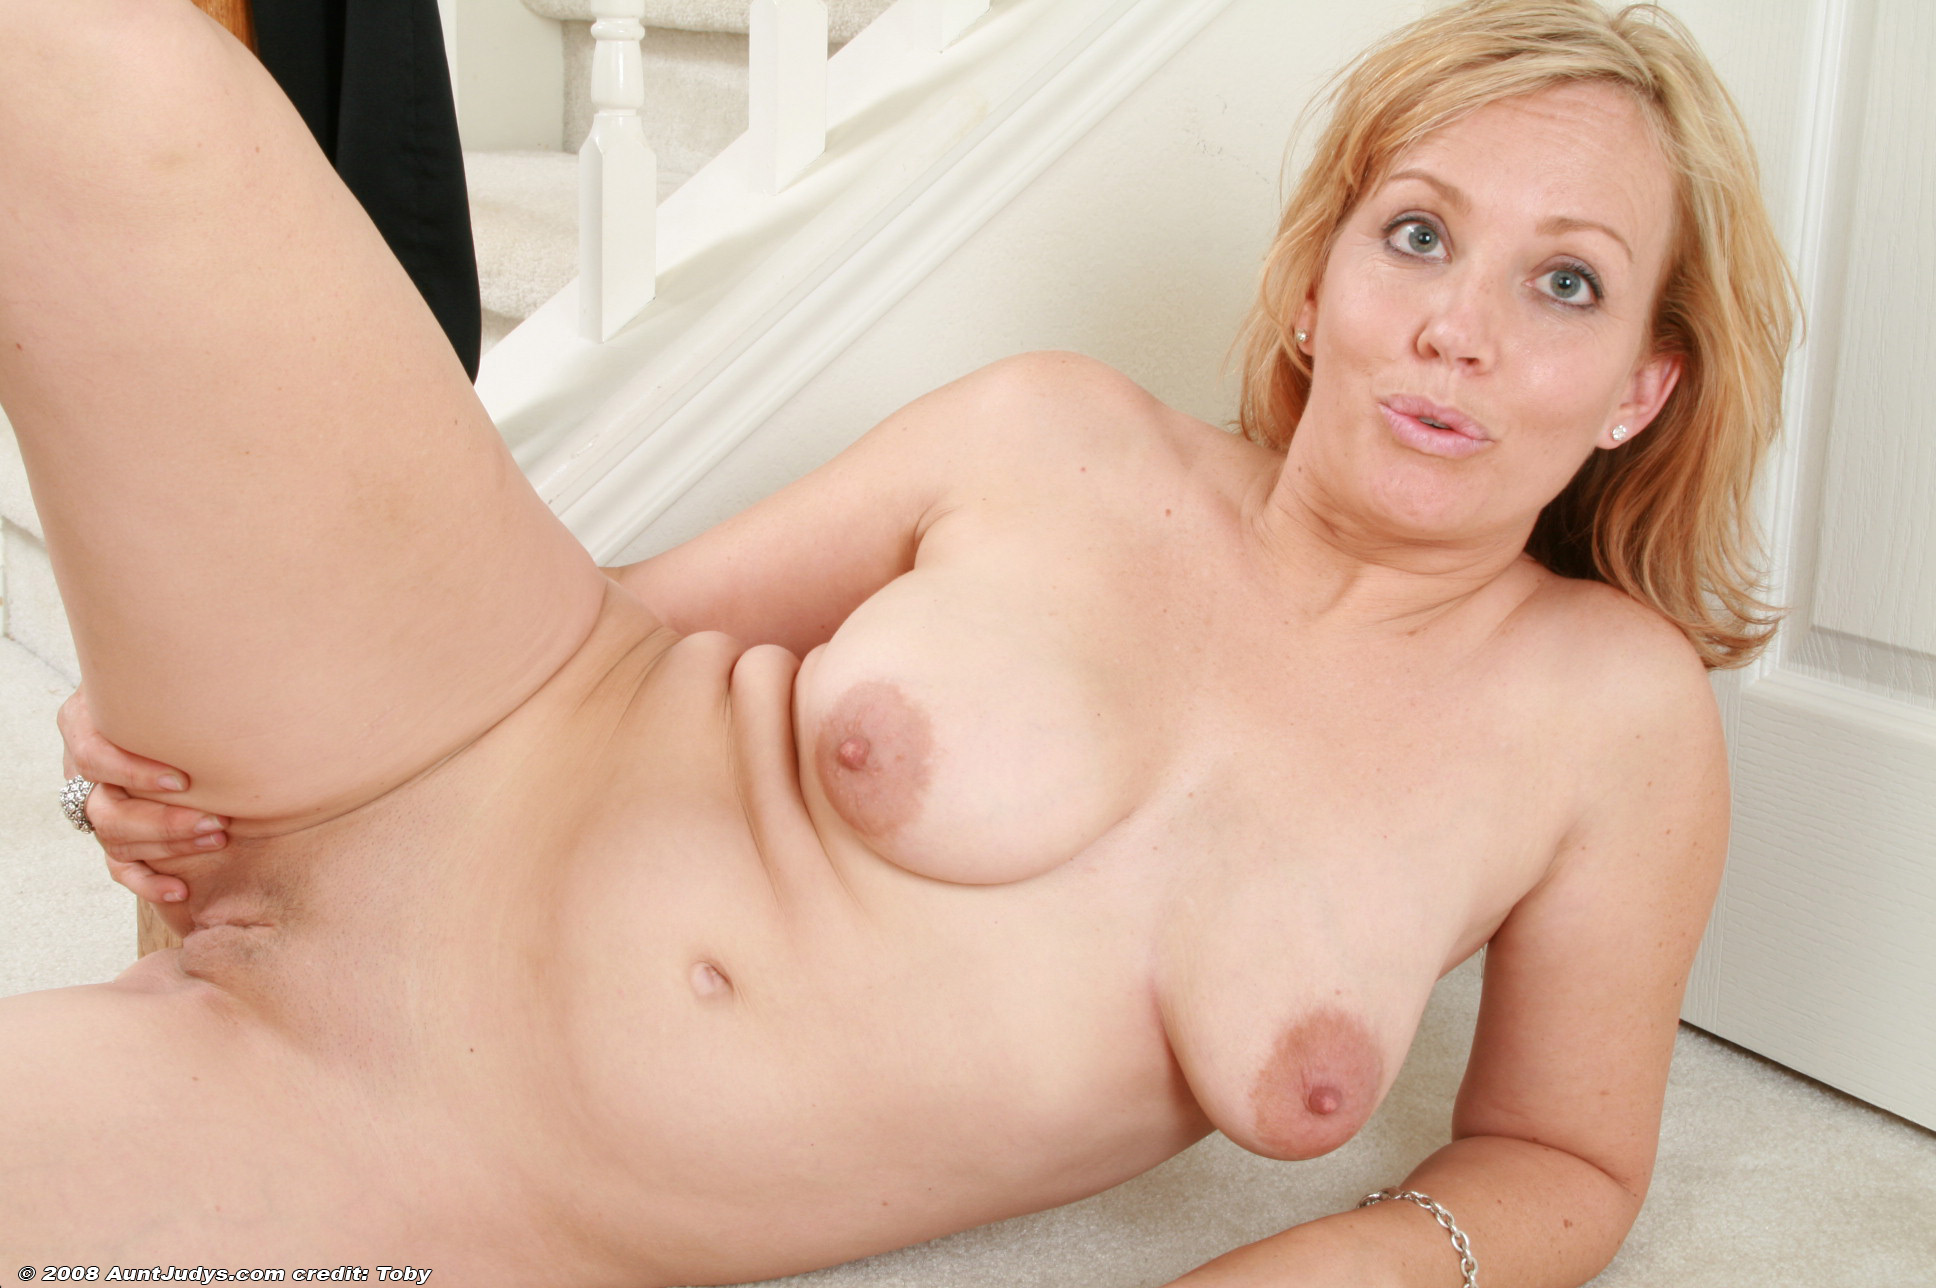 Katie leung nude emma watson